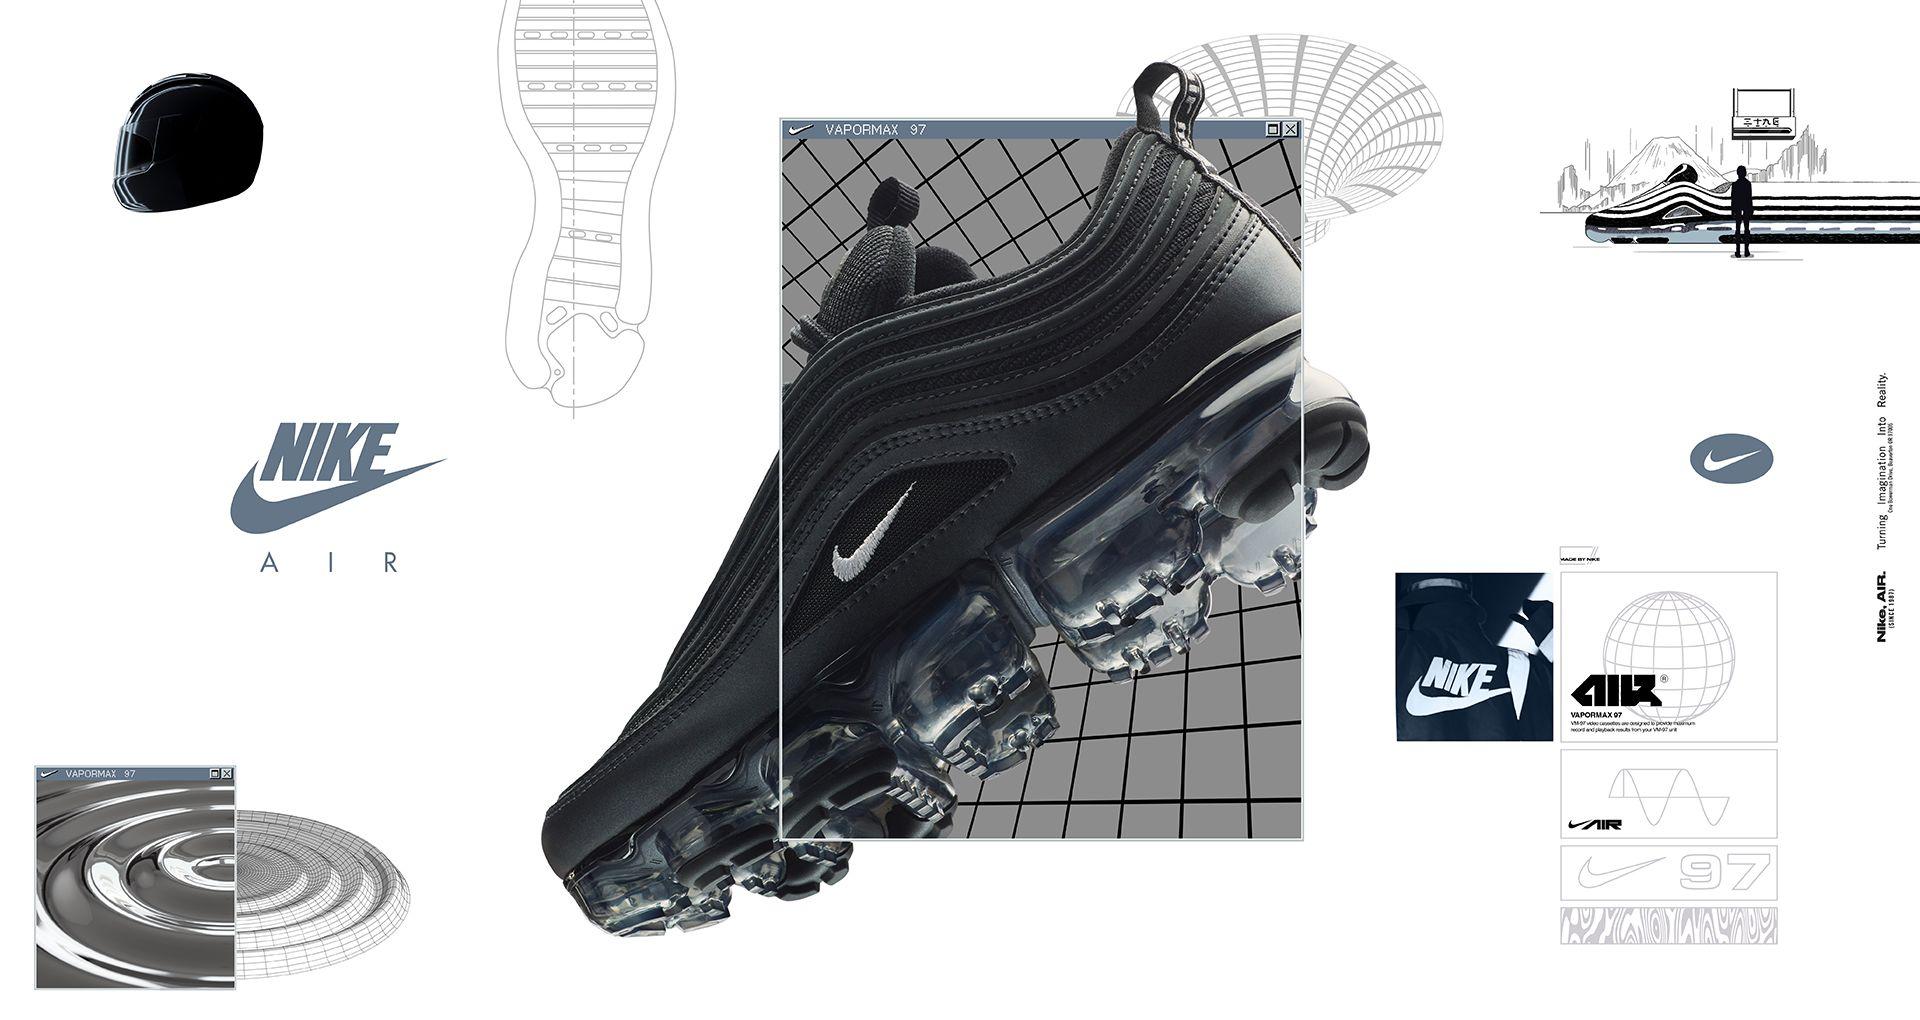 timeless design e1e12 56a47 Nike Women's Air VaporMax 97 'Metallic Hematite & Black ...